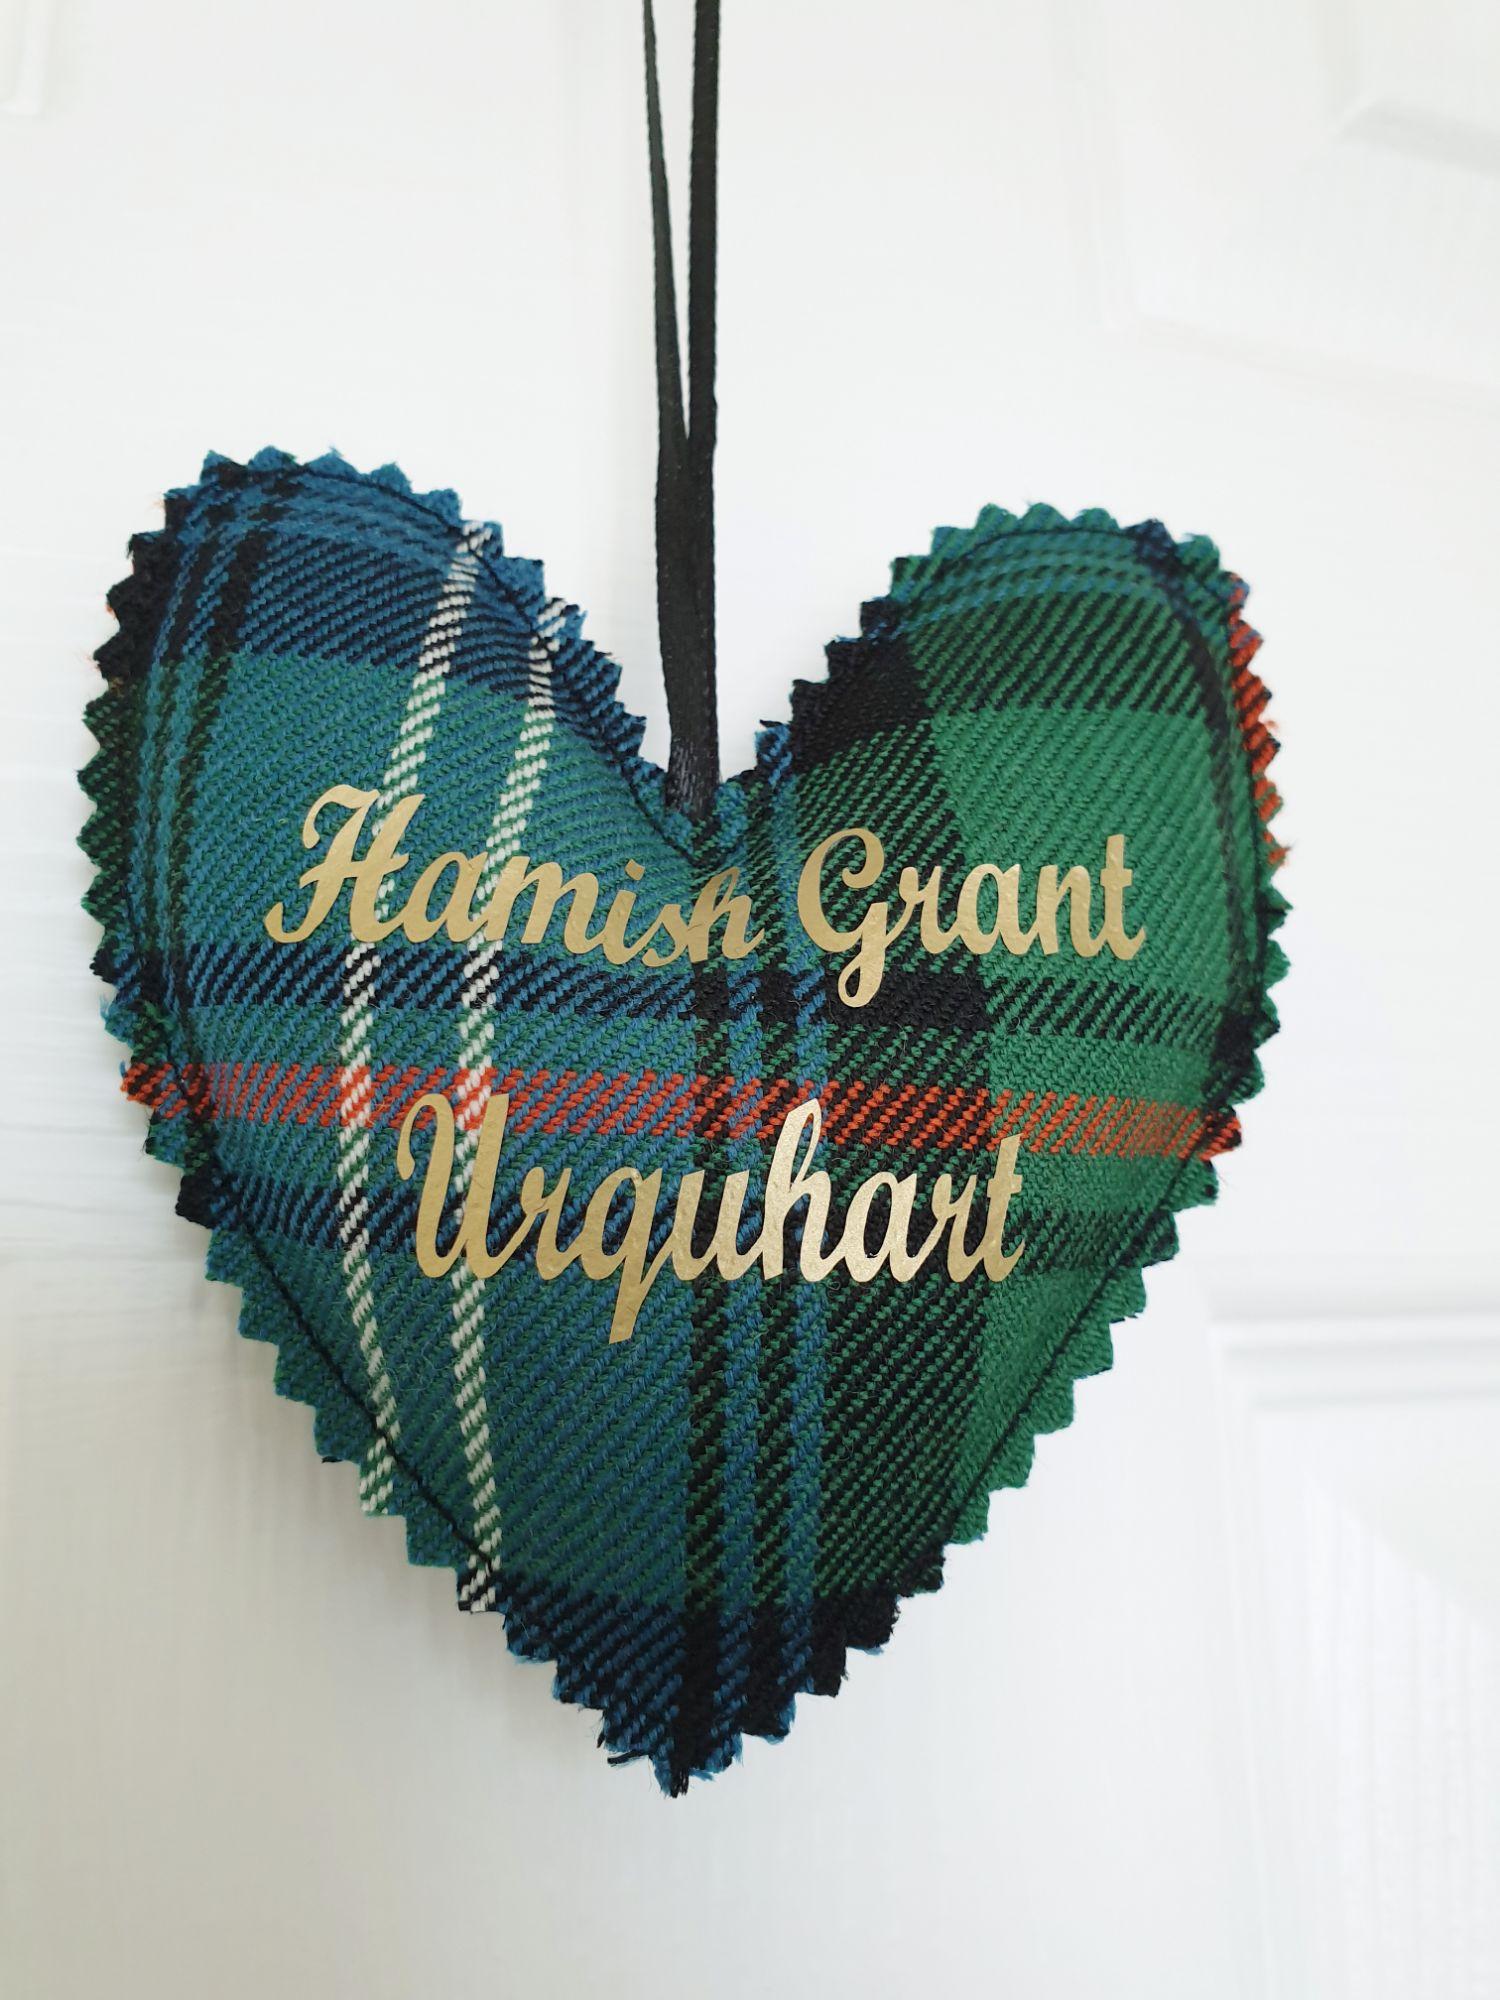 Urquhart tartan gift idea